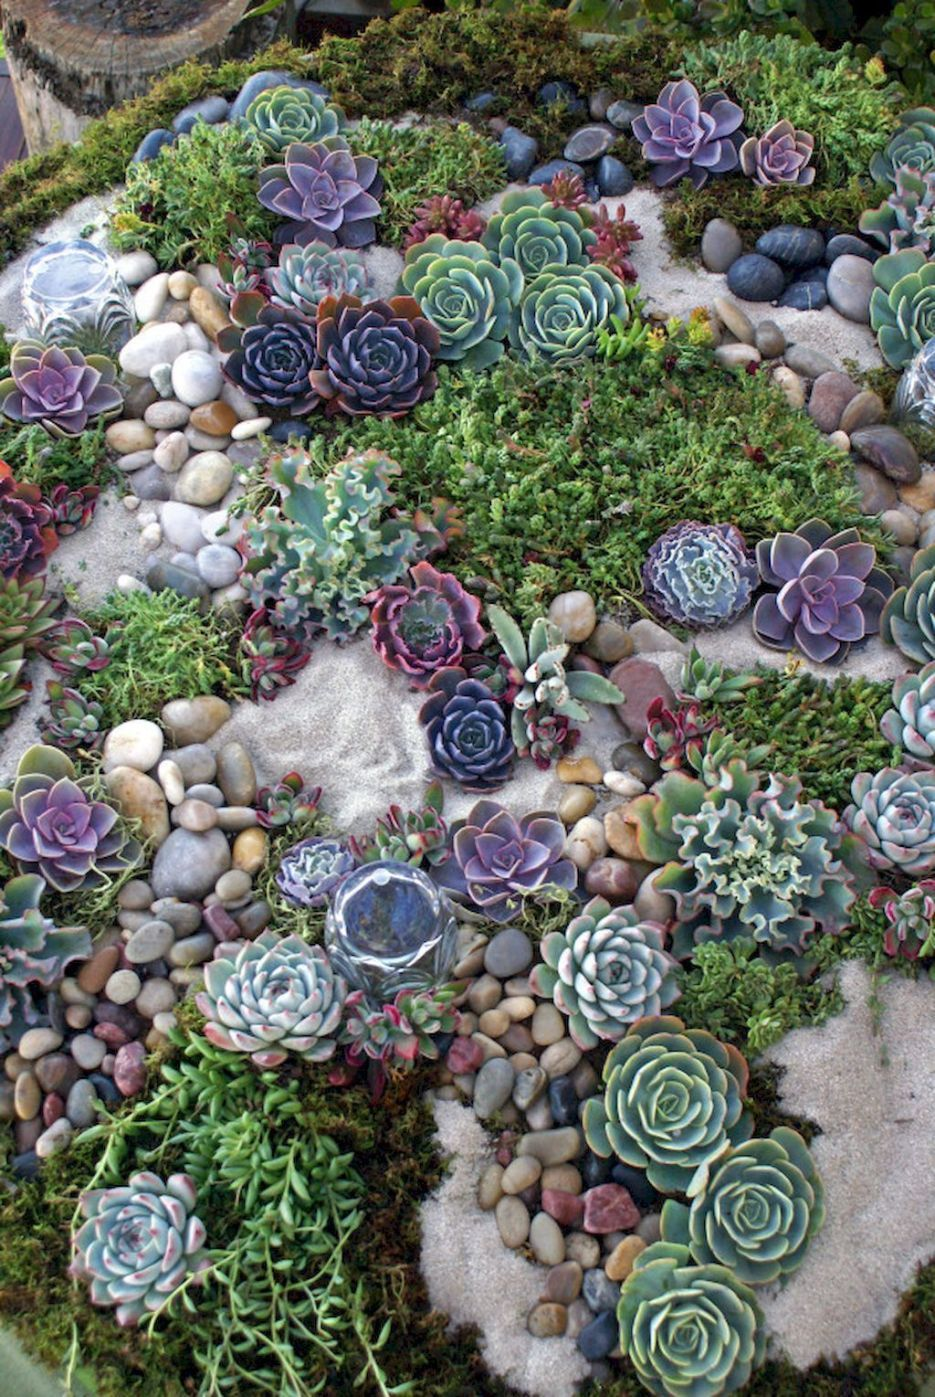 21 Inspirational Gardening Ideas Fancydecors Succulent Rock Garden Landscaping With Rocks Rock Garden Design